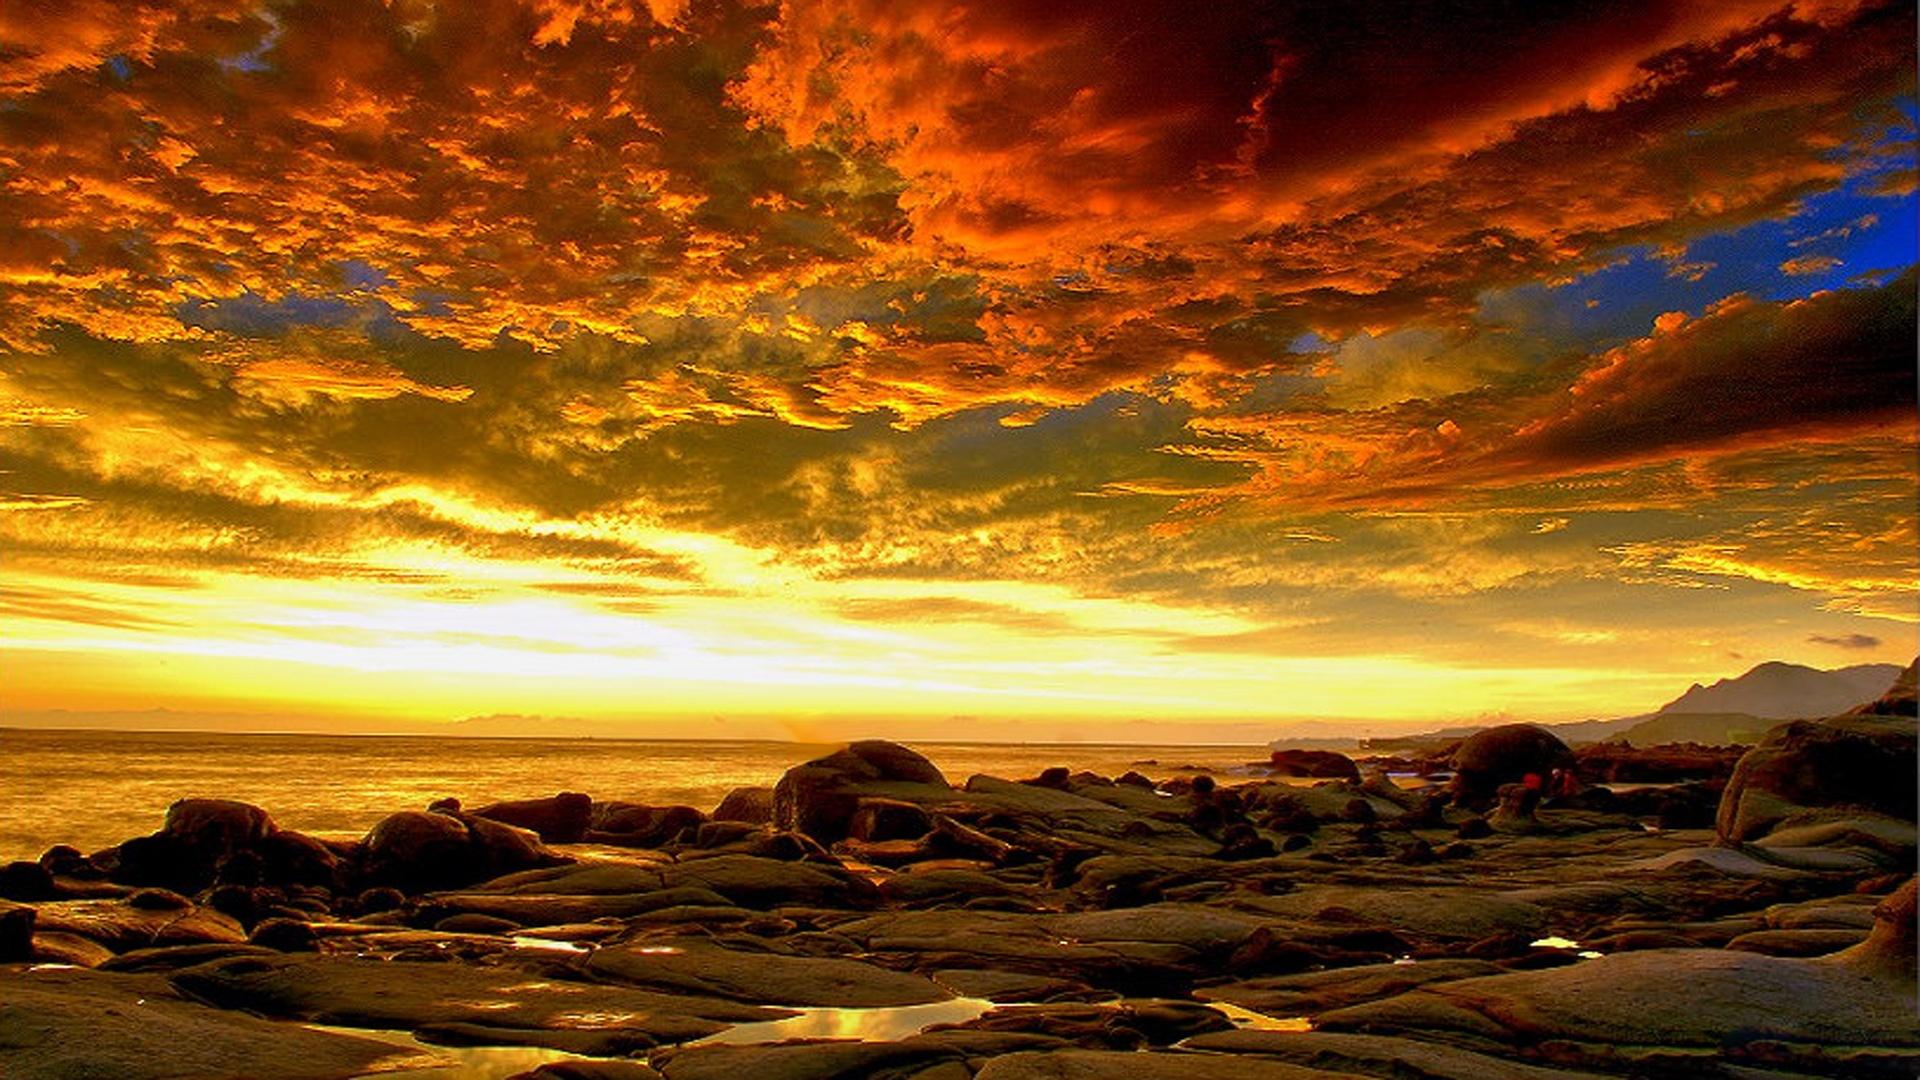 Beautiful Sky Backgrounds Hd 1920x1080 Wallpaper Teahub Io